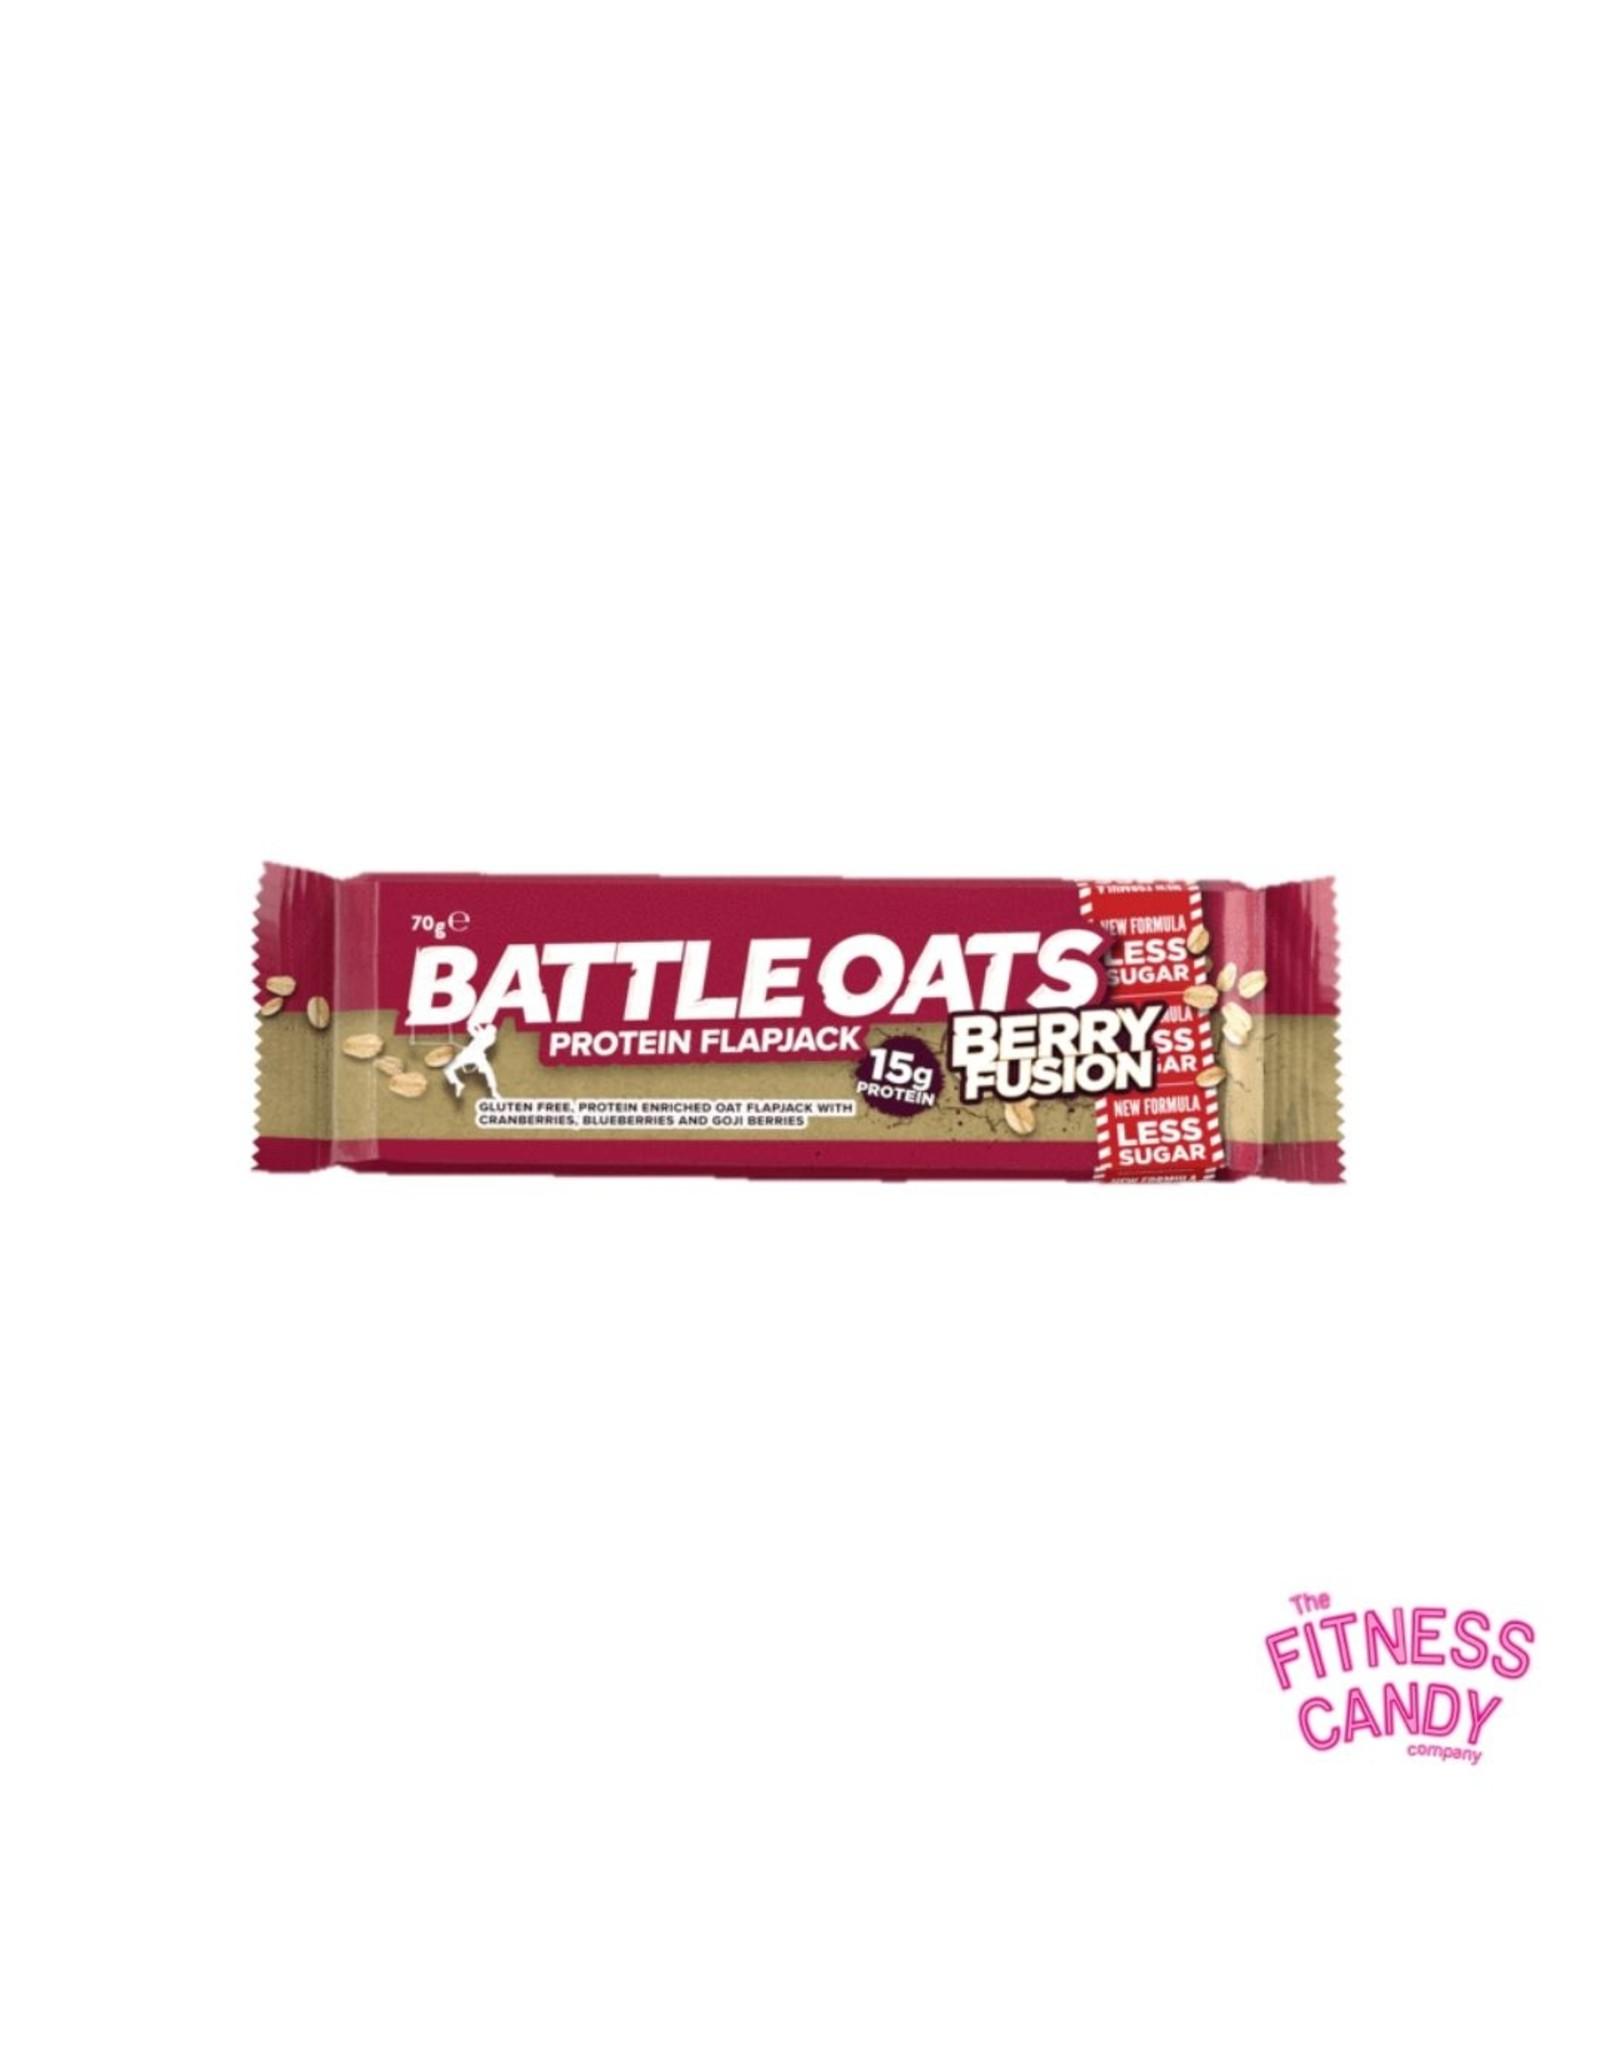 Battle Oats BATTLE OATS PROTEIN FLAPJACK BERRY FUSION